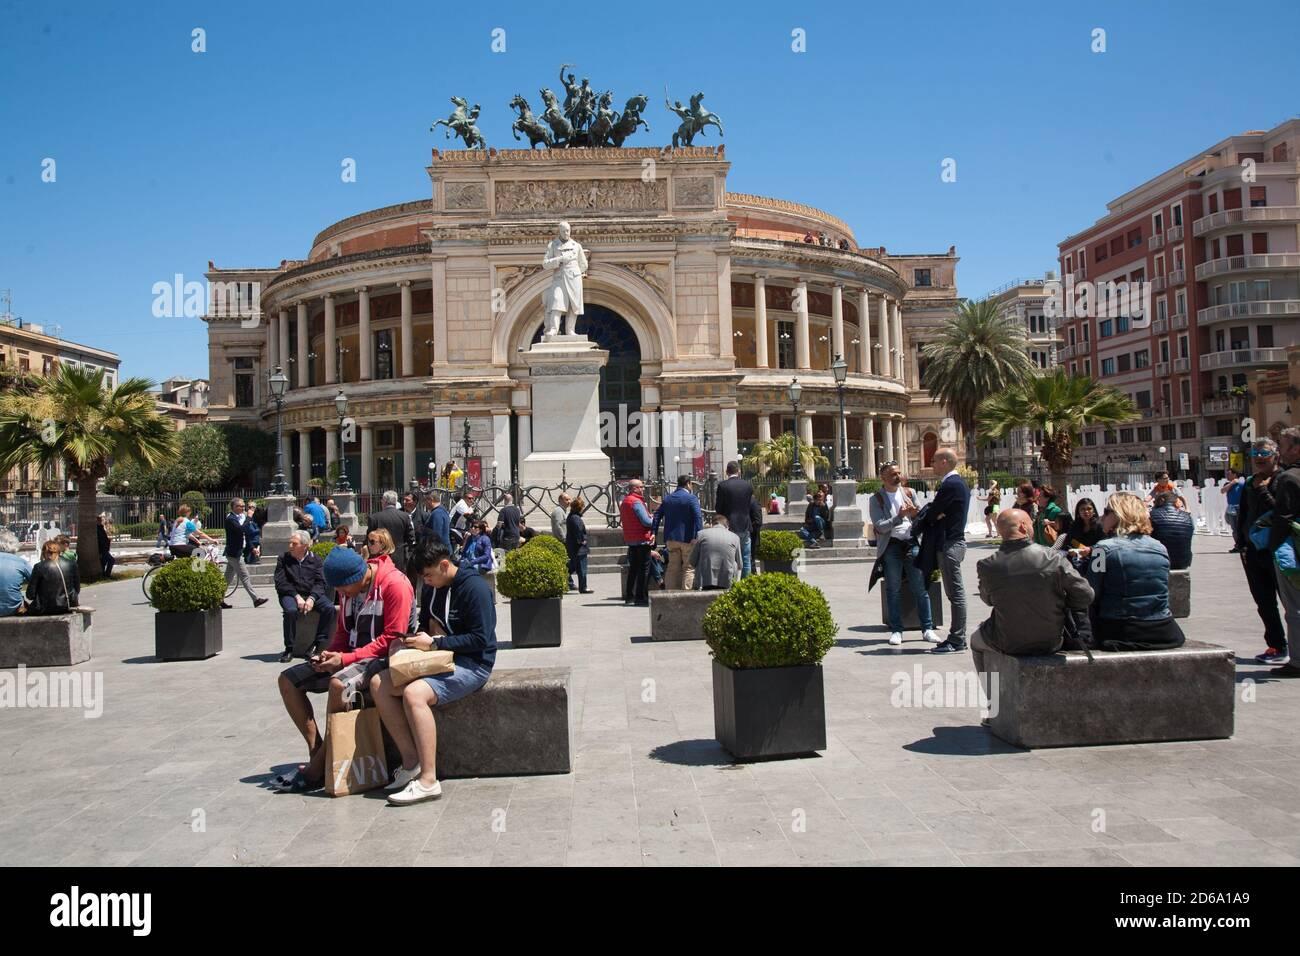 1MAY Teatro Politeama Garibaldi Palermo,Sicilien,Italien. Stock Photo